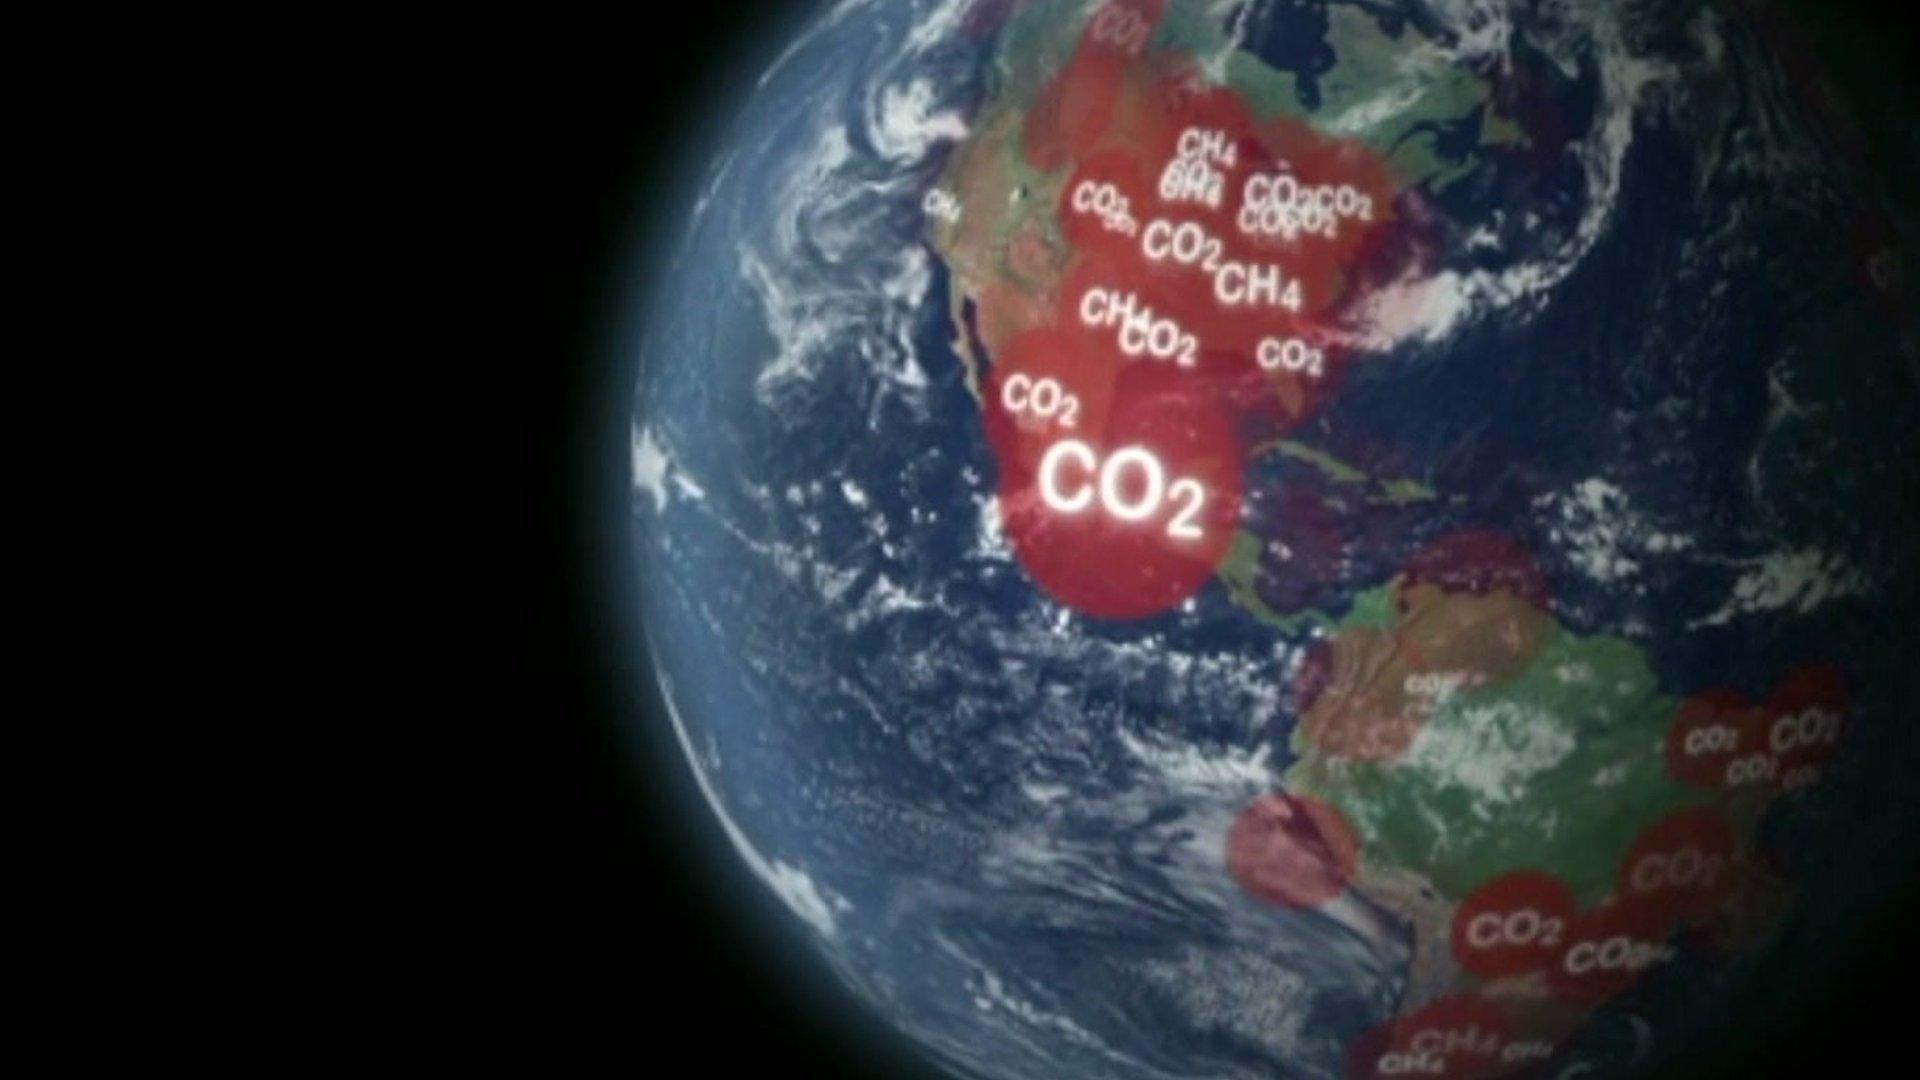 A 'magic bullet' to capture carbon dioxide?